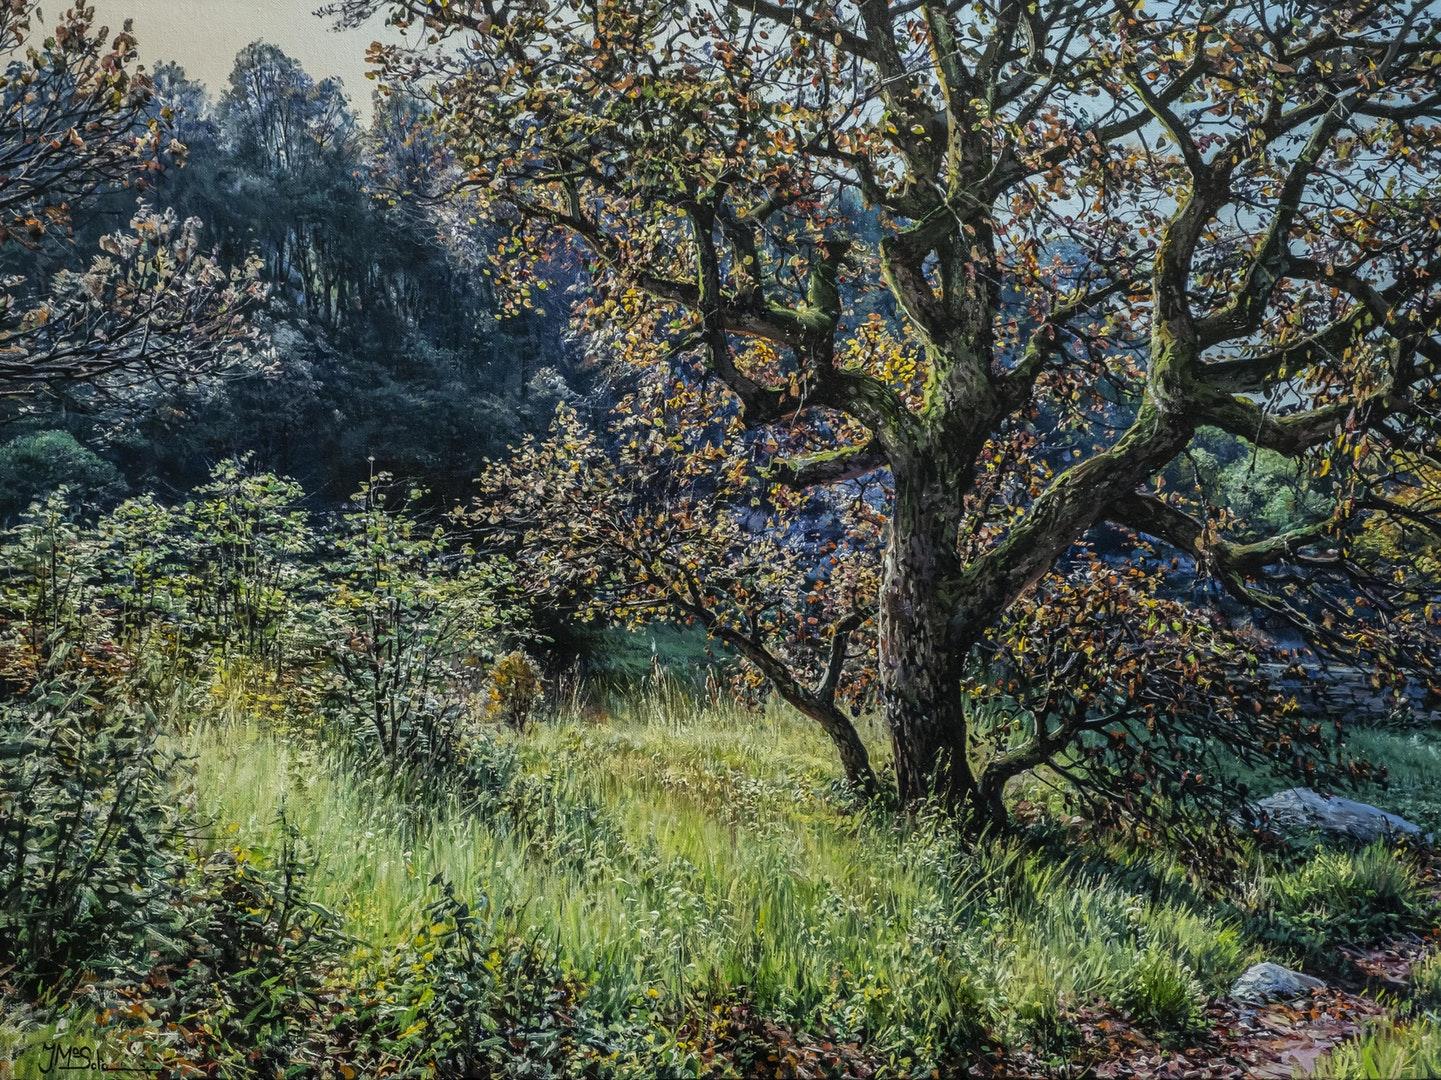 'The oak tree', Josep M. Solà, Oil on linen, 60 x 81 cm